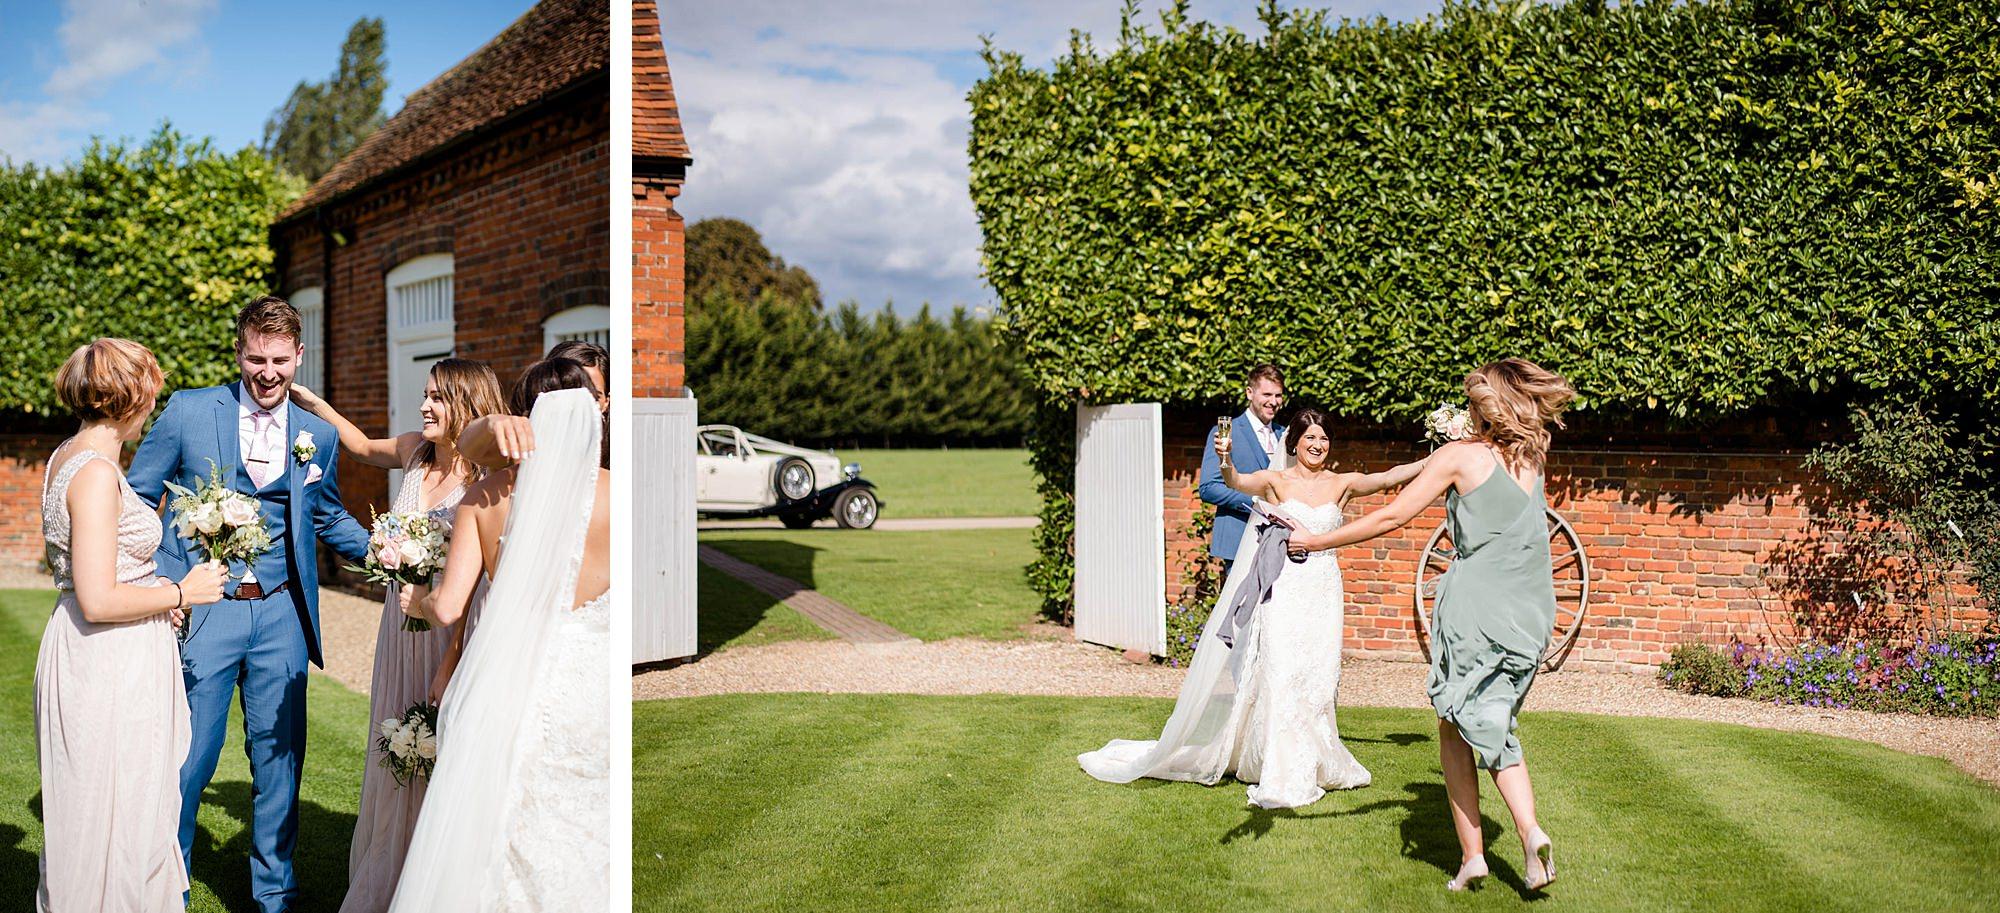 Lillibrooke Manor wedding guests hug bride and groom after ceremony